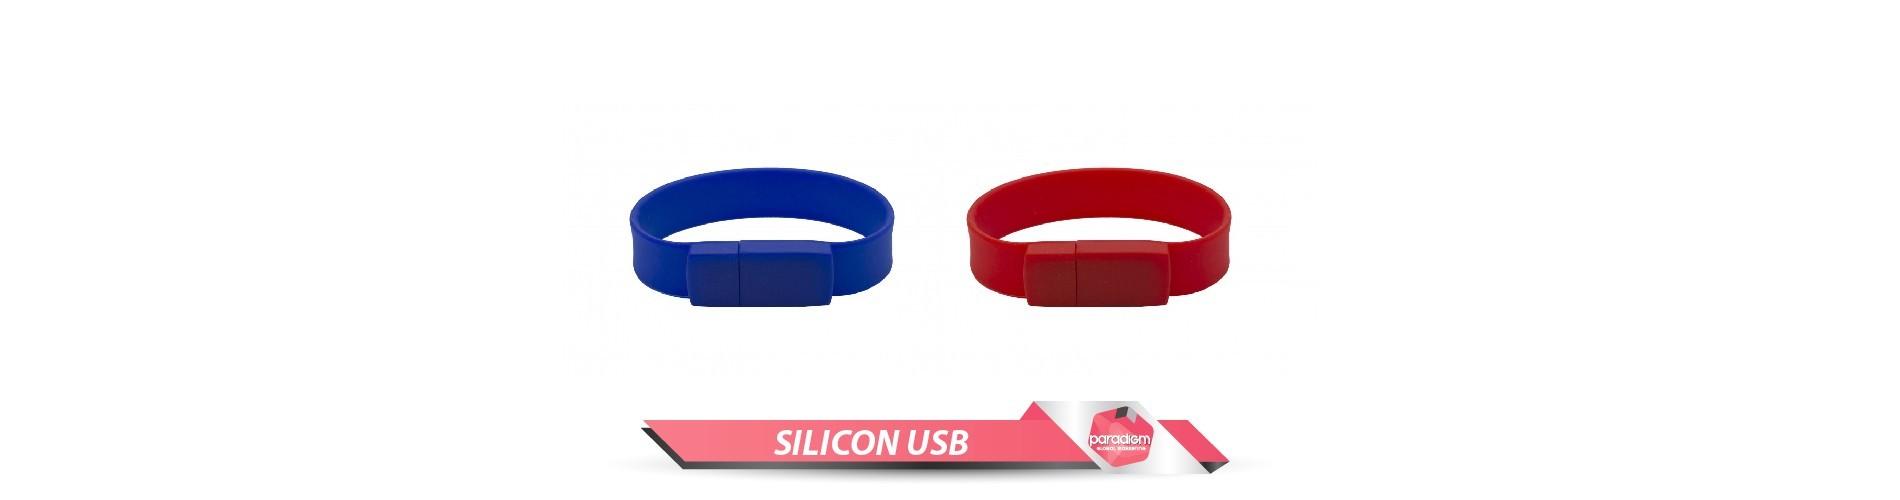 Bracelets silicone series USB